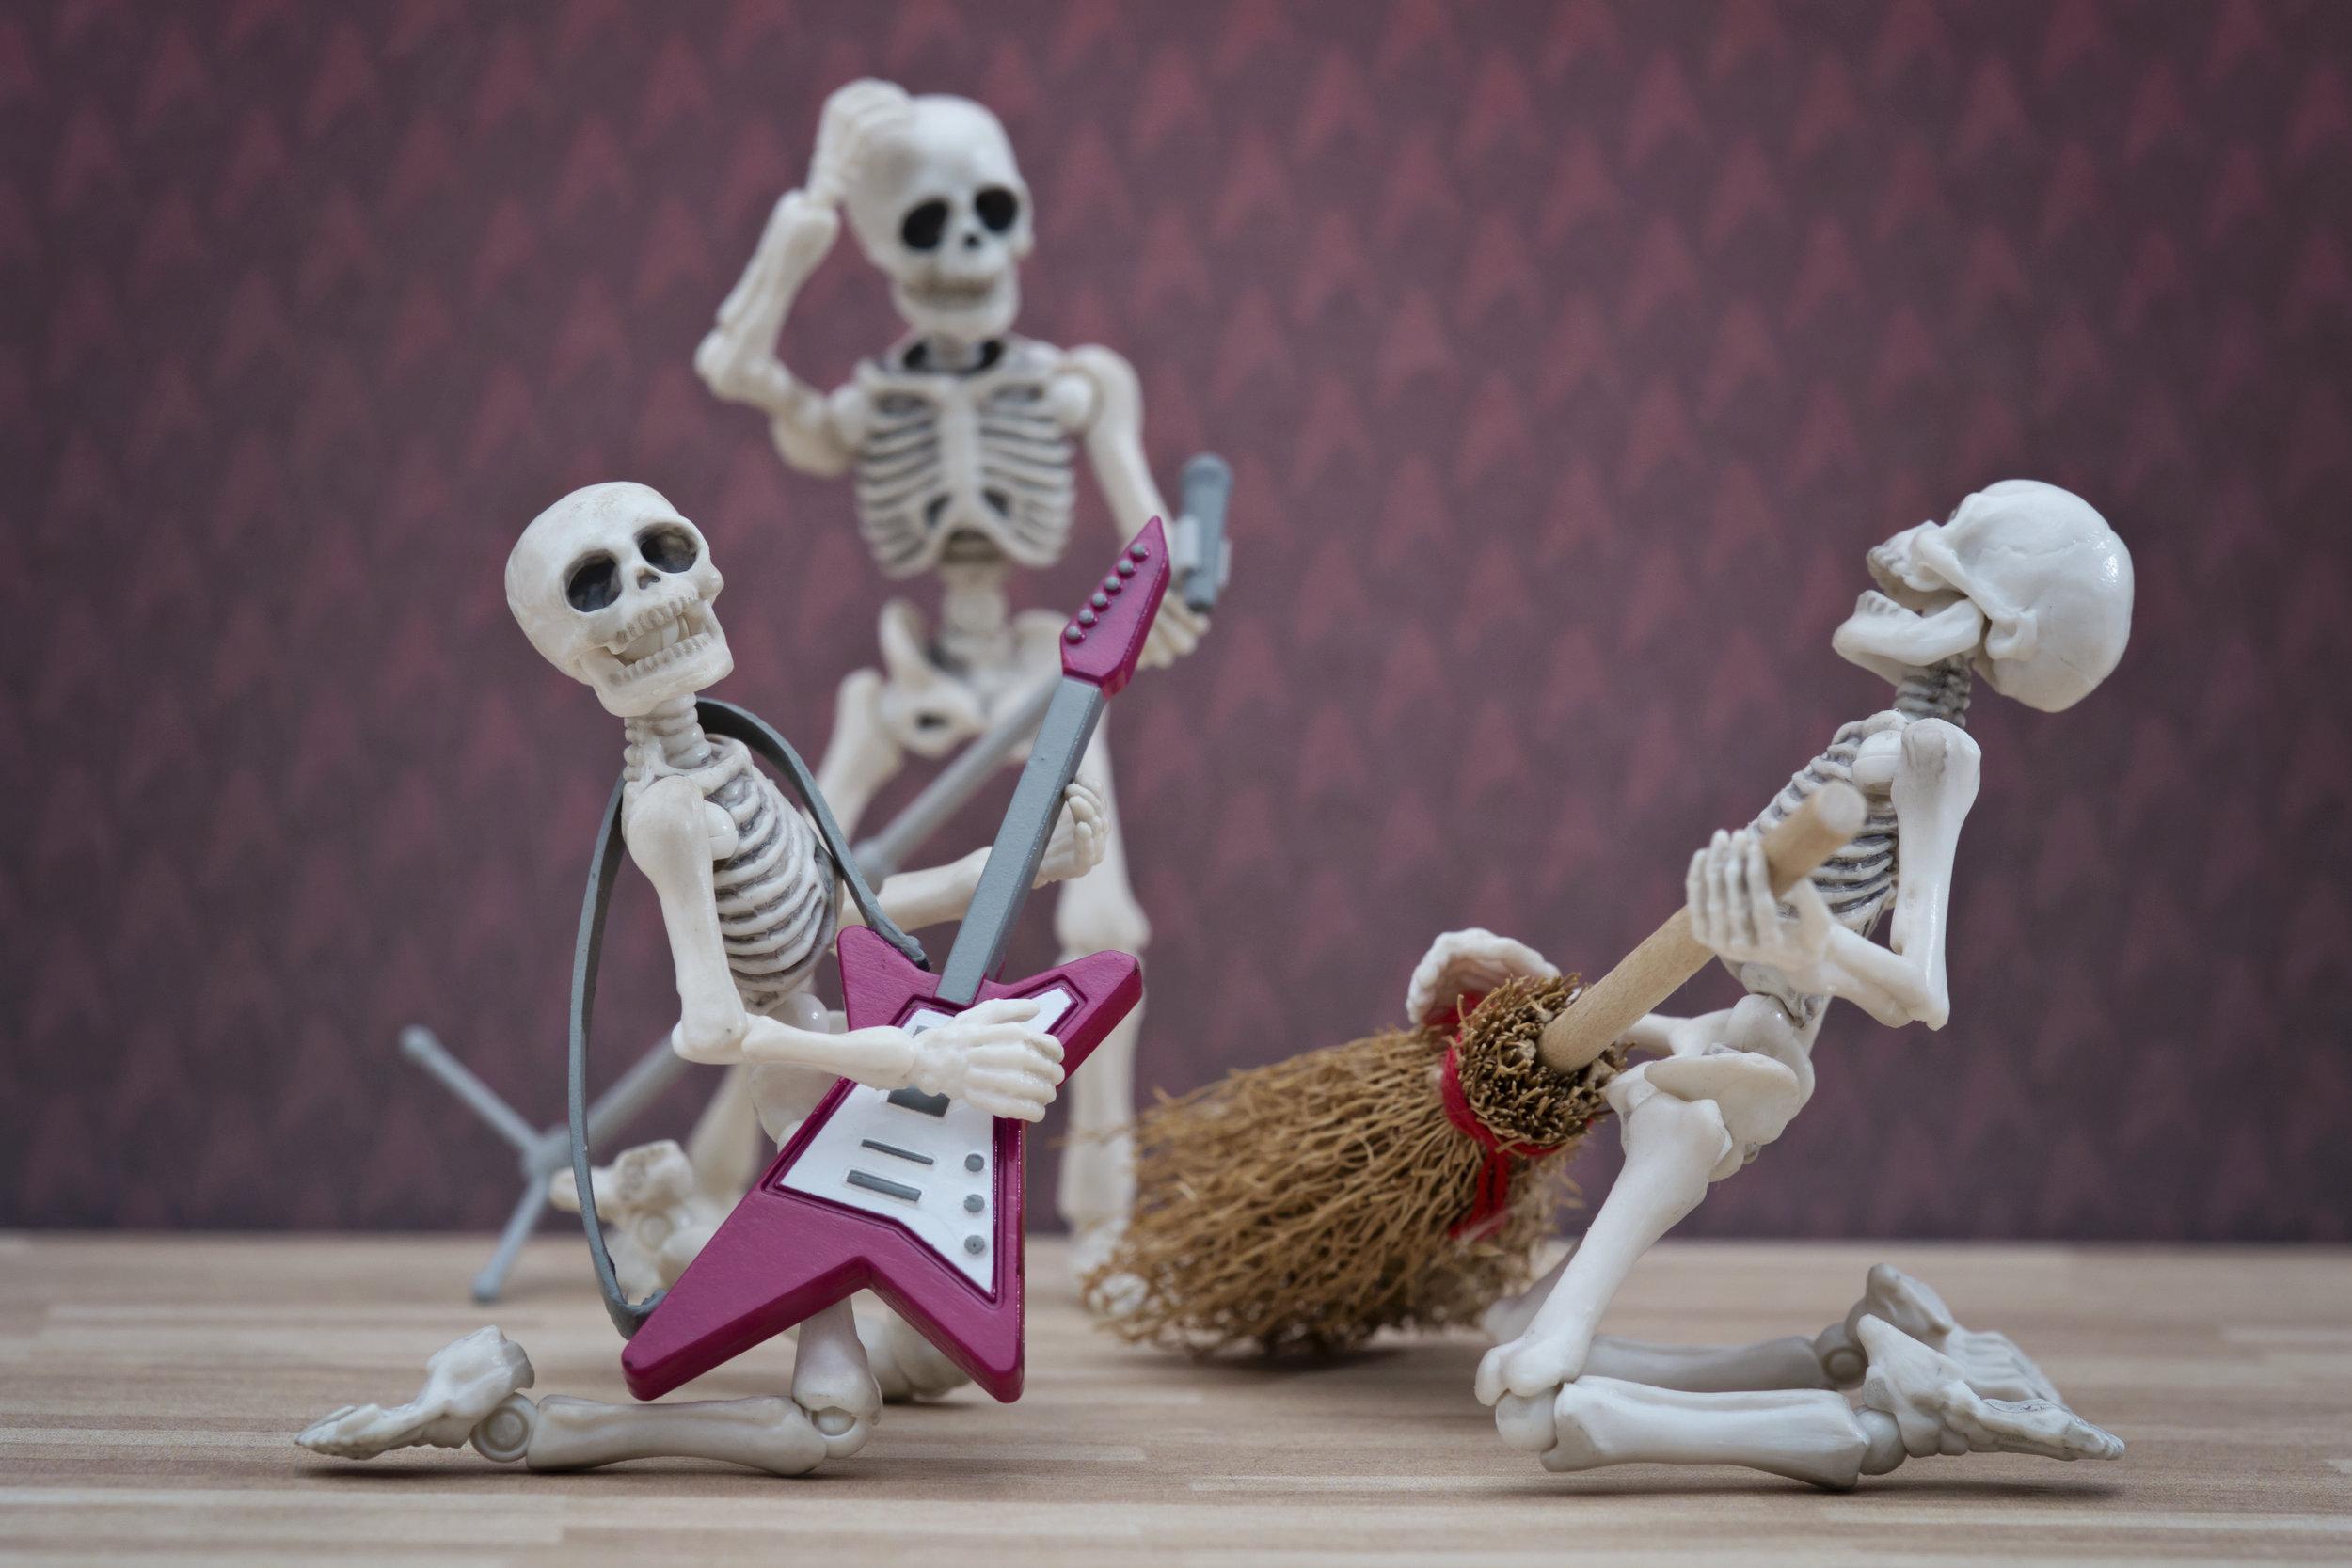 Skeleton playing broom as guitar